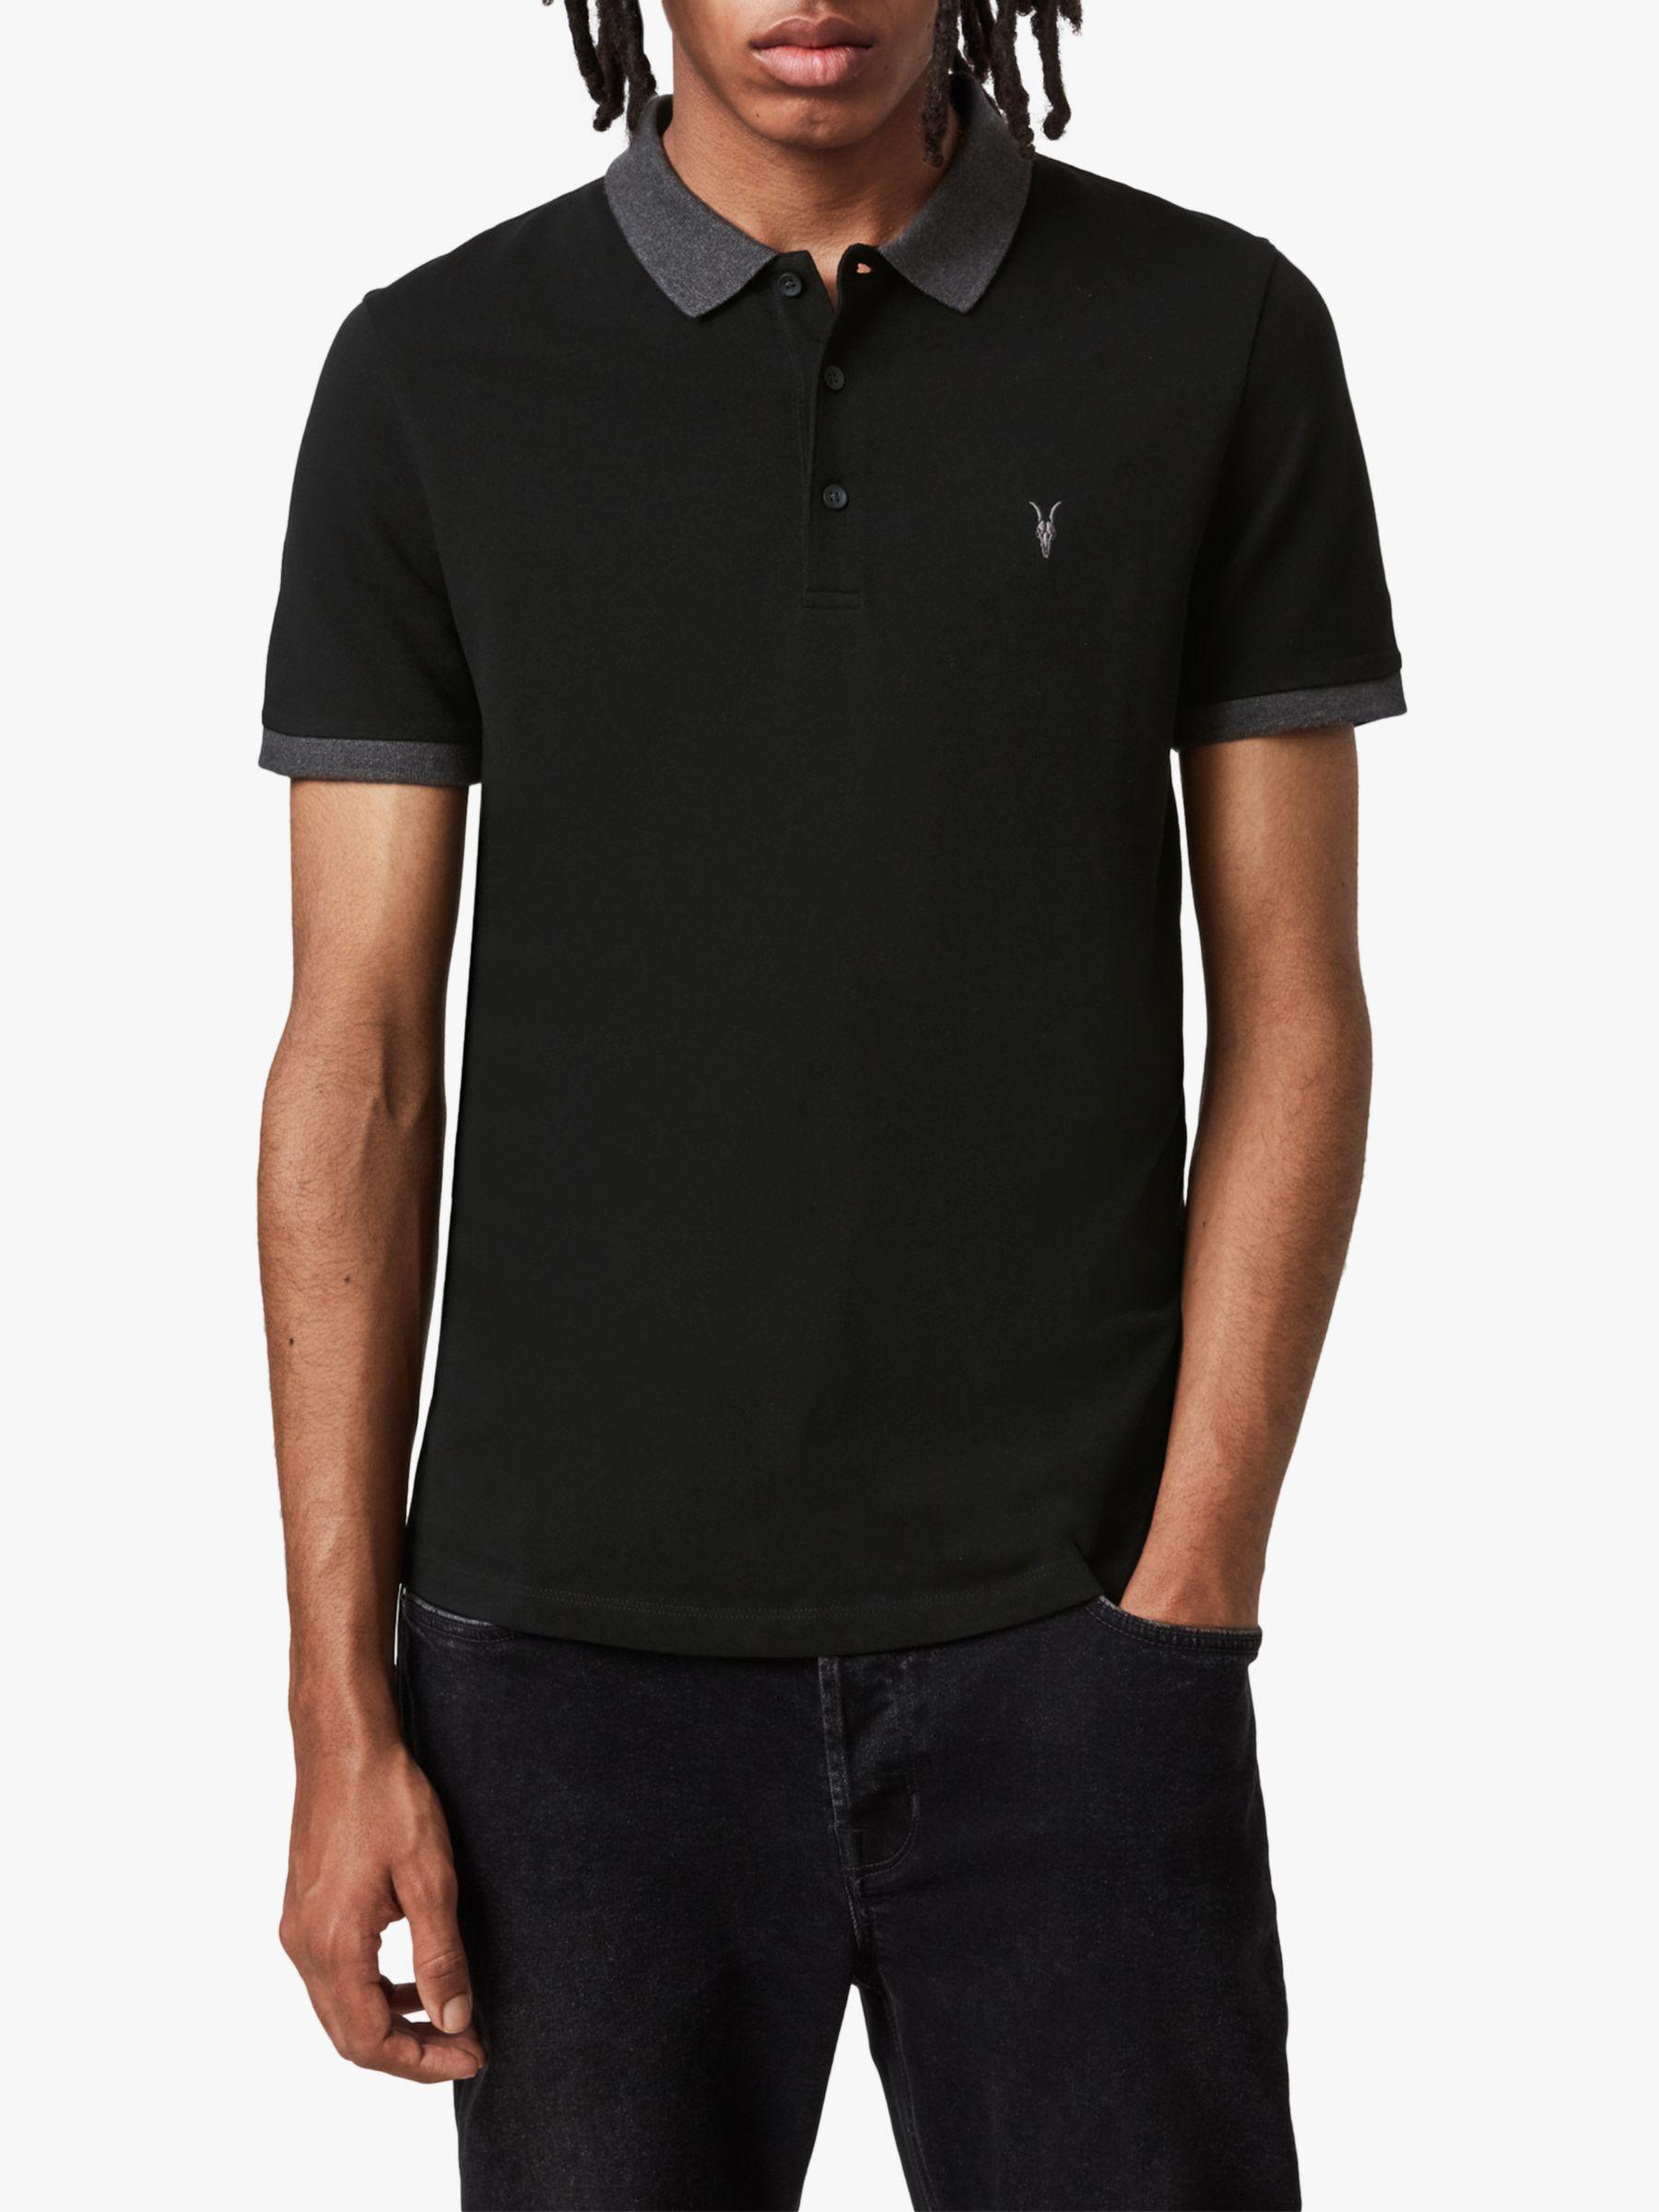 AllSaints AllSaints Orlando Contrast Short Sleeve Polo Shirt, Jet Black/Charcoal